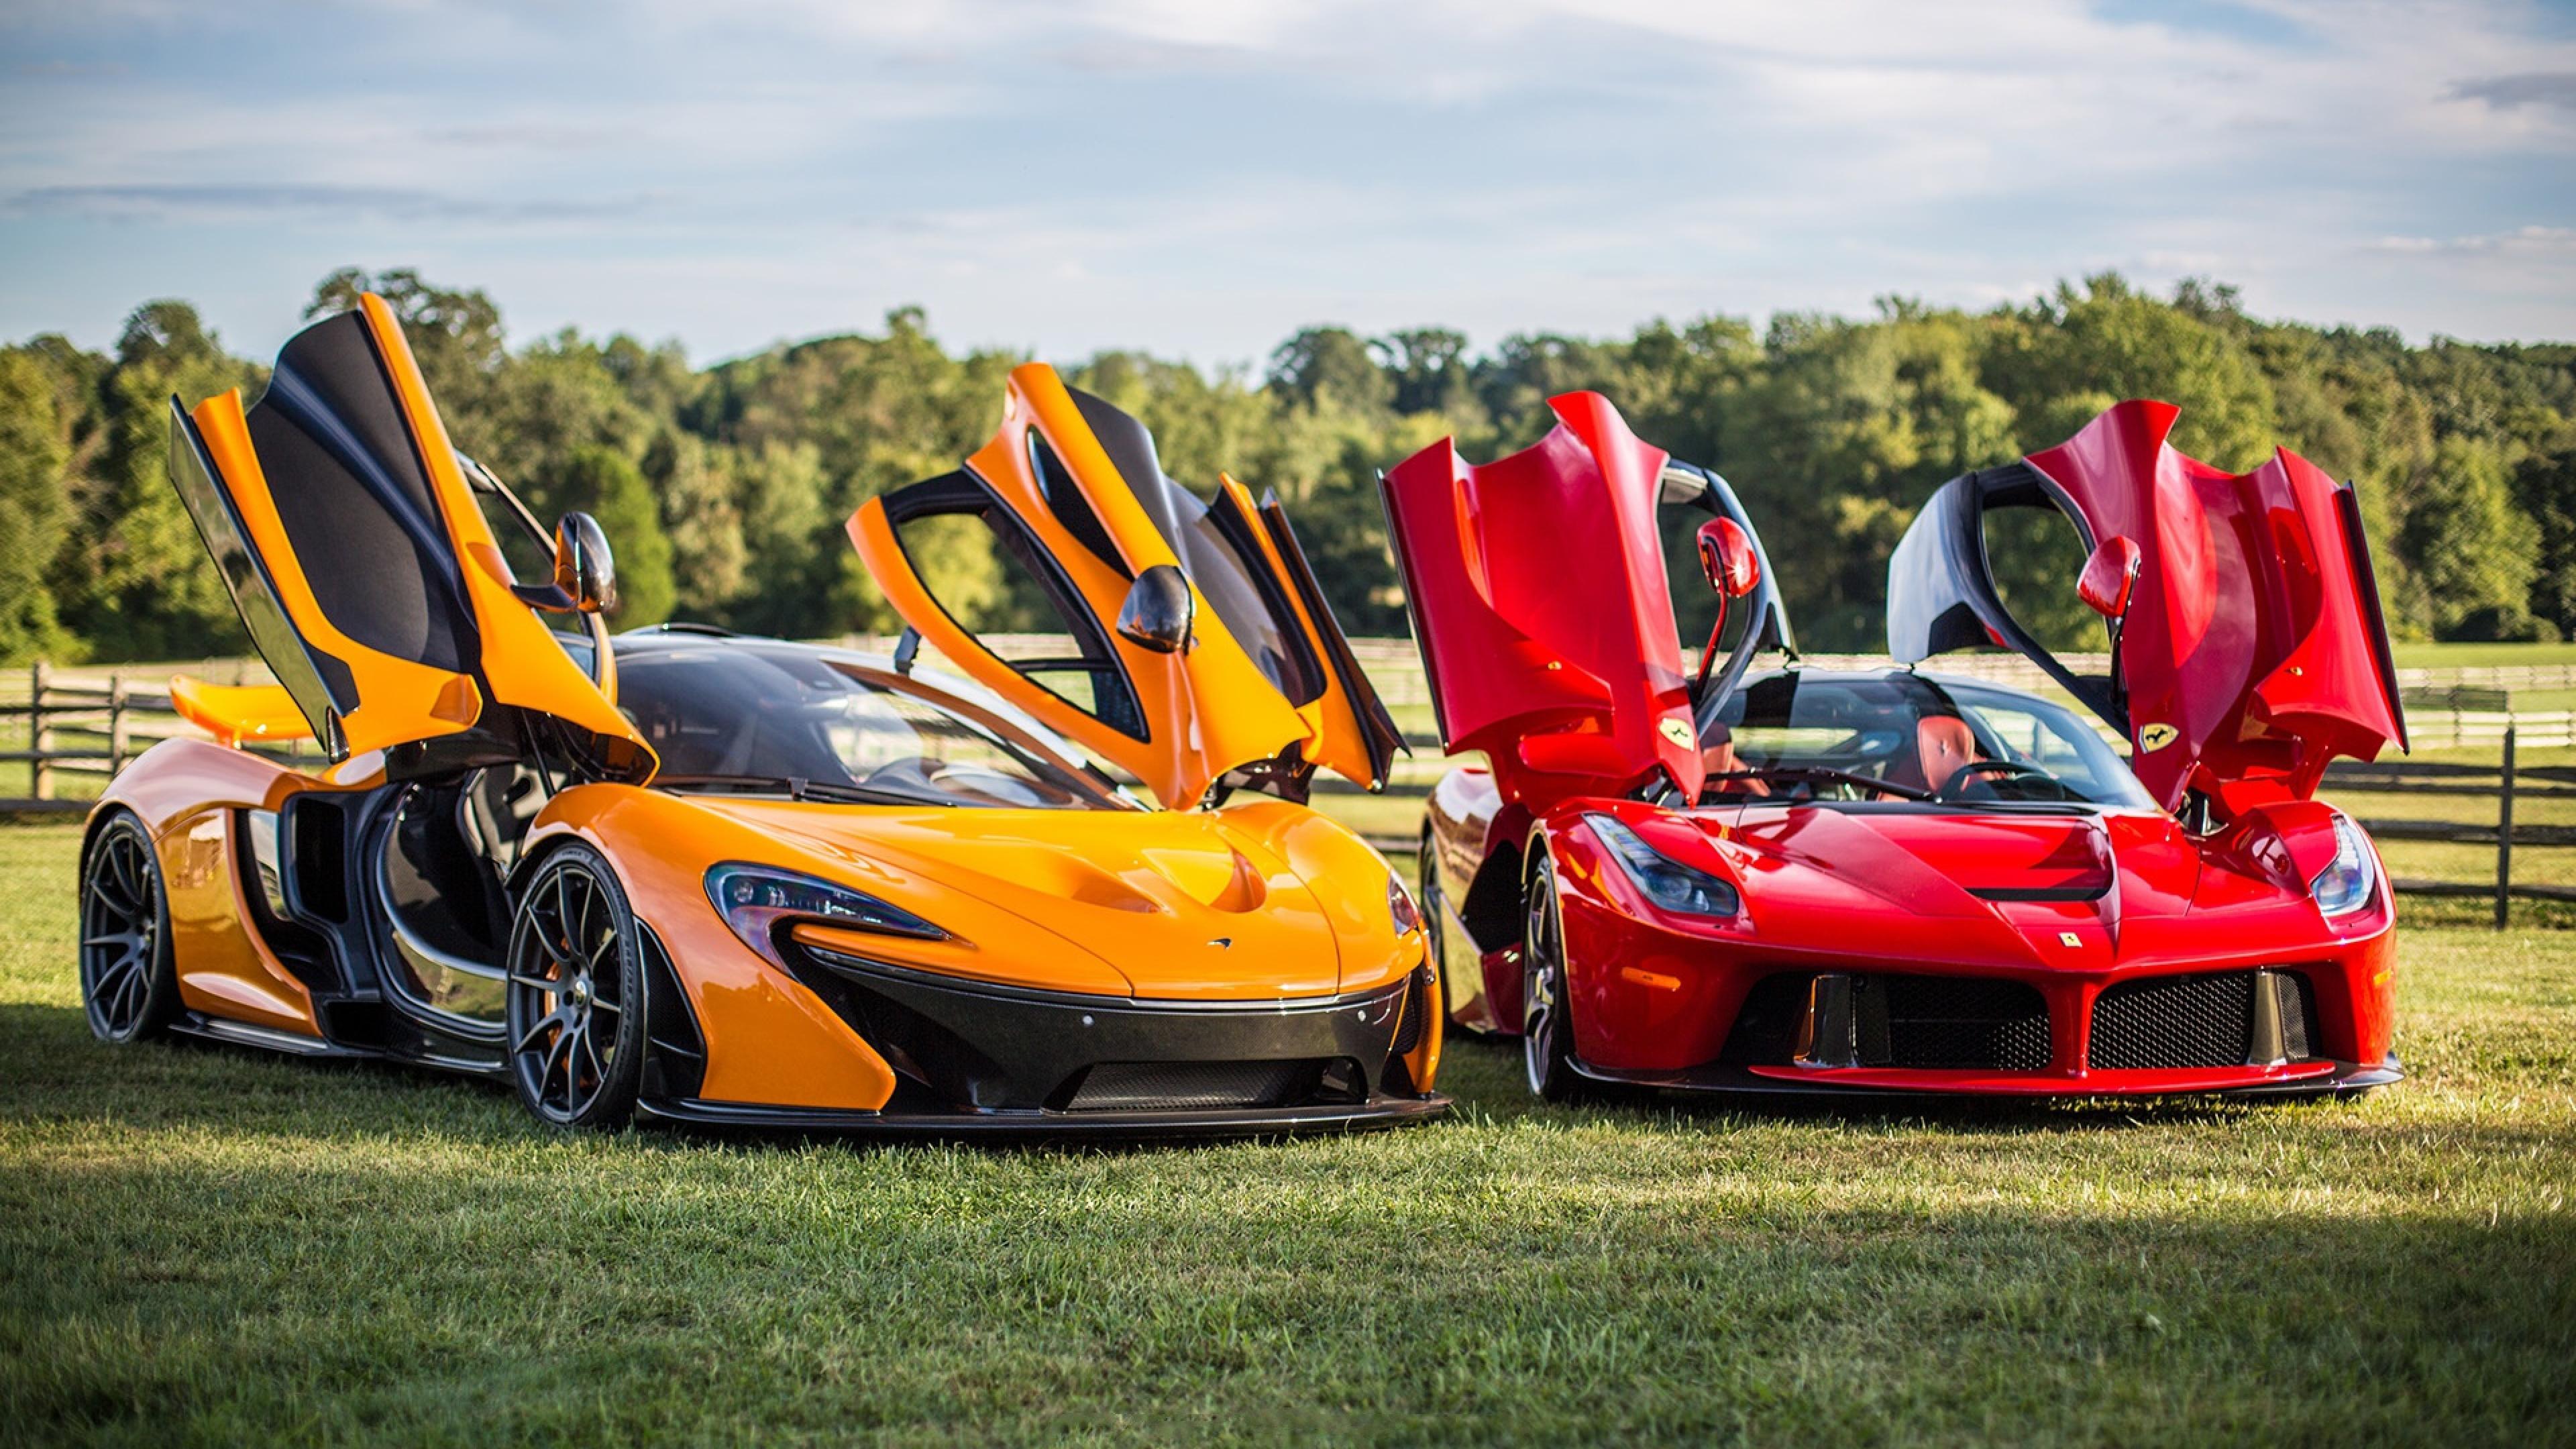 Which One Is Better Mclaren P1 Or Ferrari Laferrari